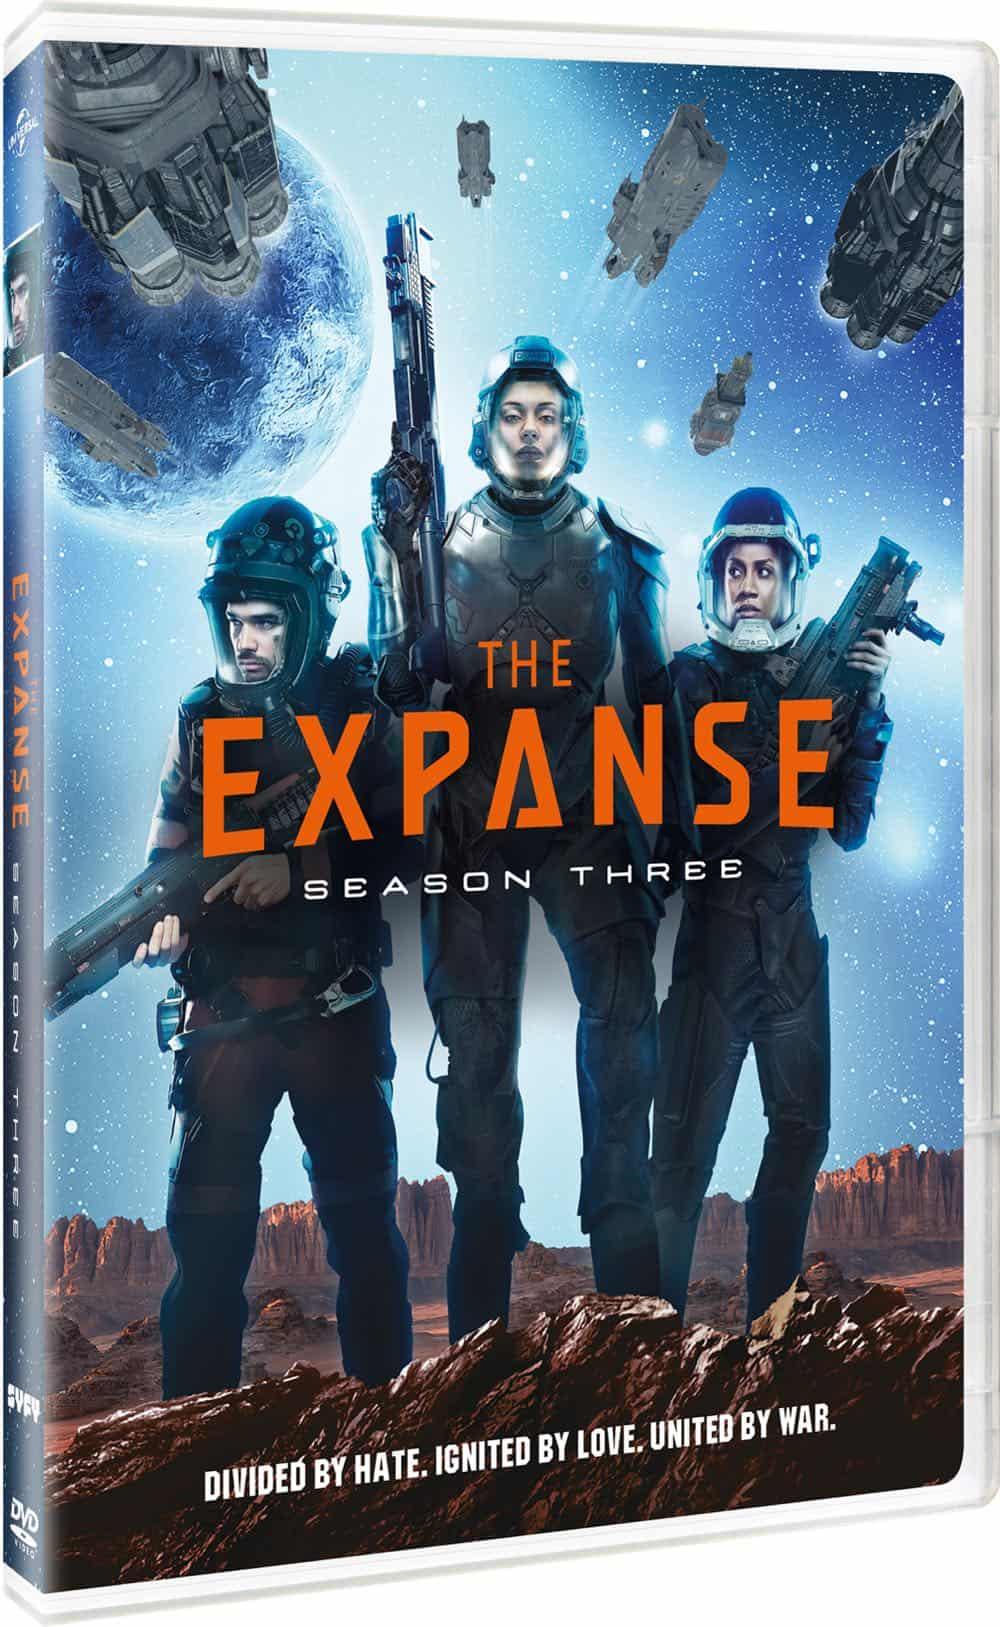 The Expanse Season 3 DVD